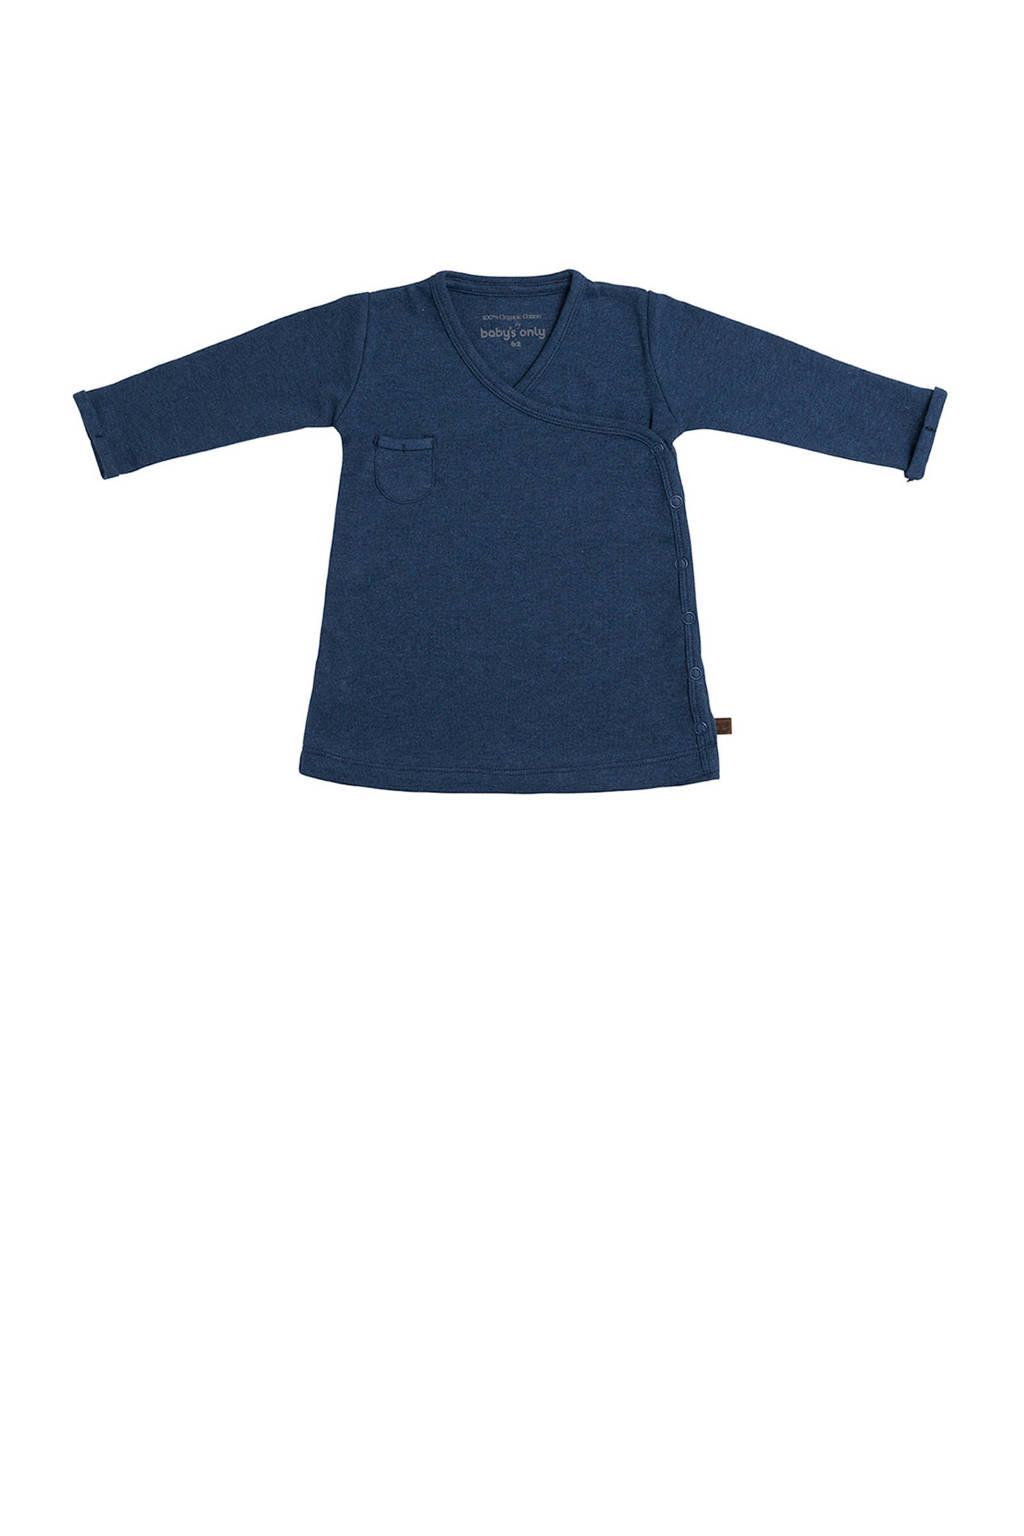 Baby's Only newborn baby jurk, Donkerblauw